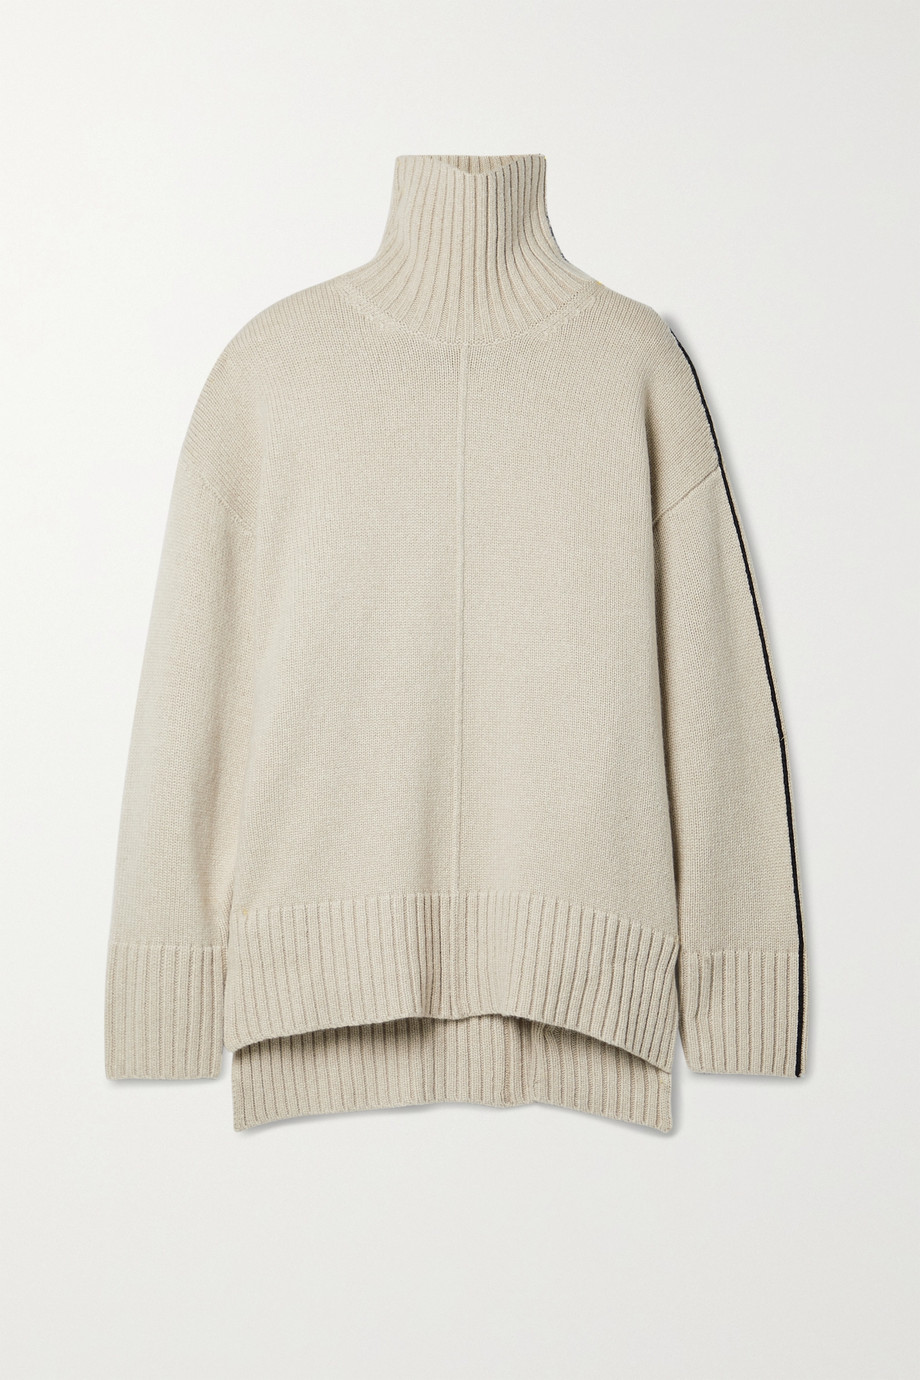 Peter Do Tattoo oversized cashmere turtleneck sweater